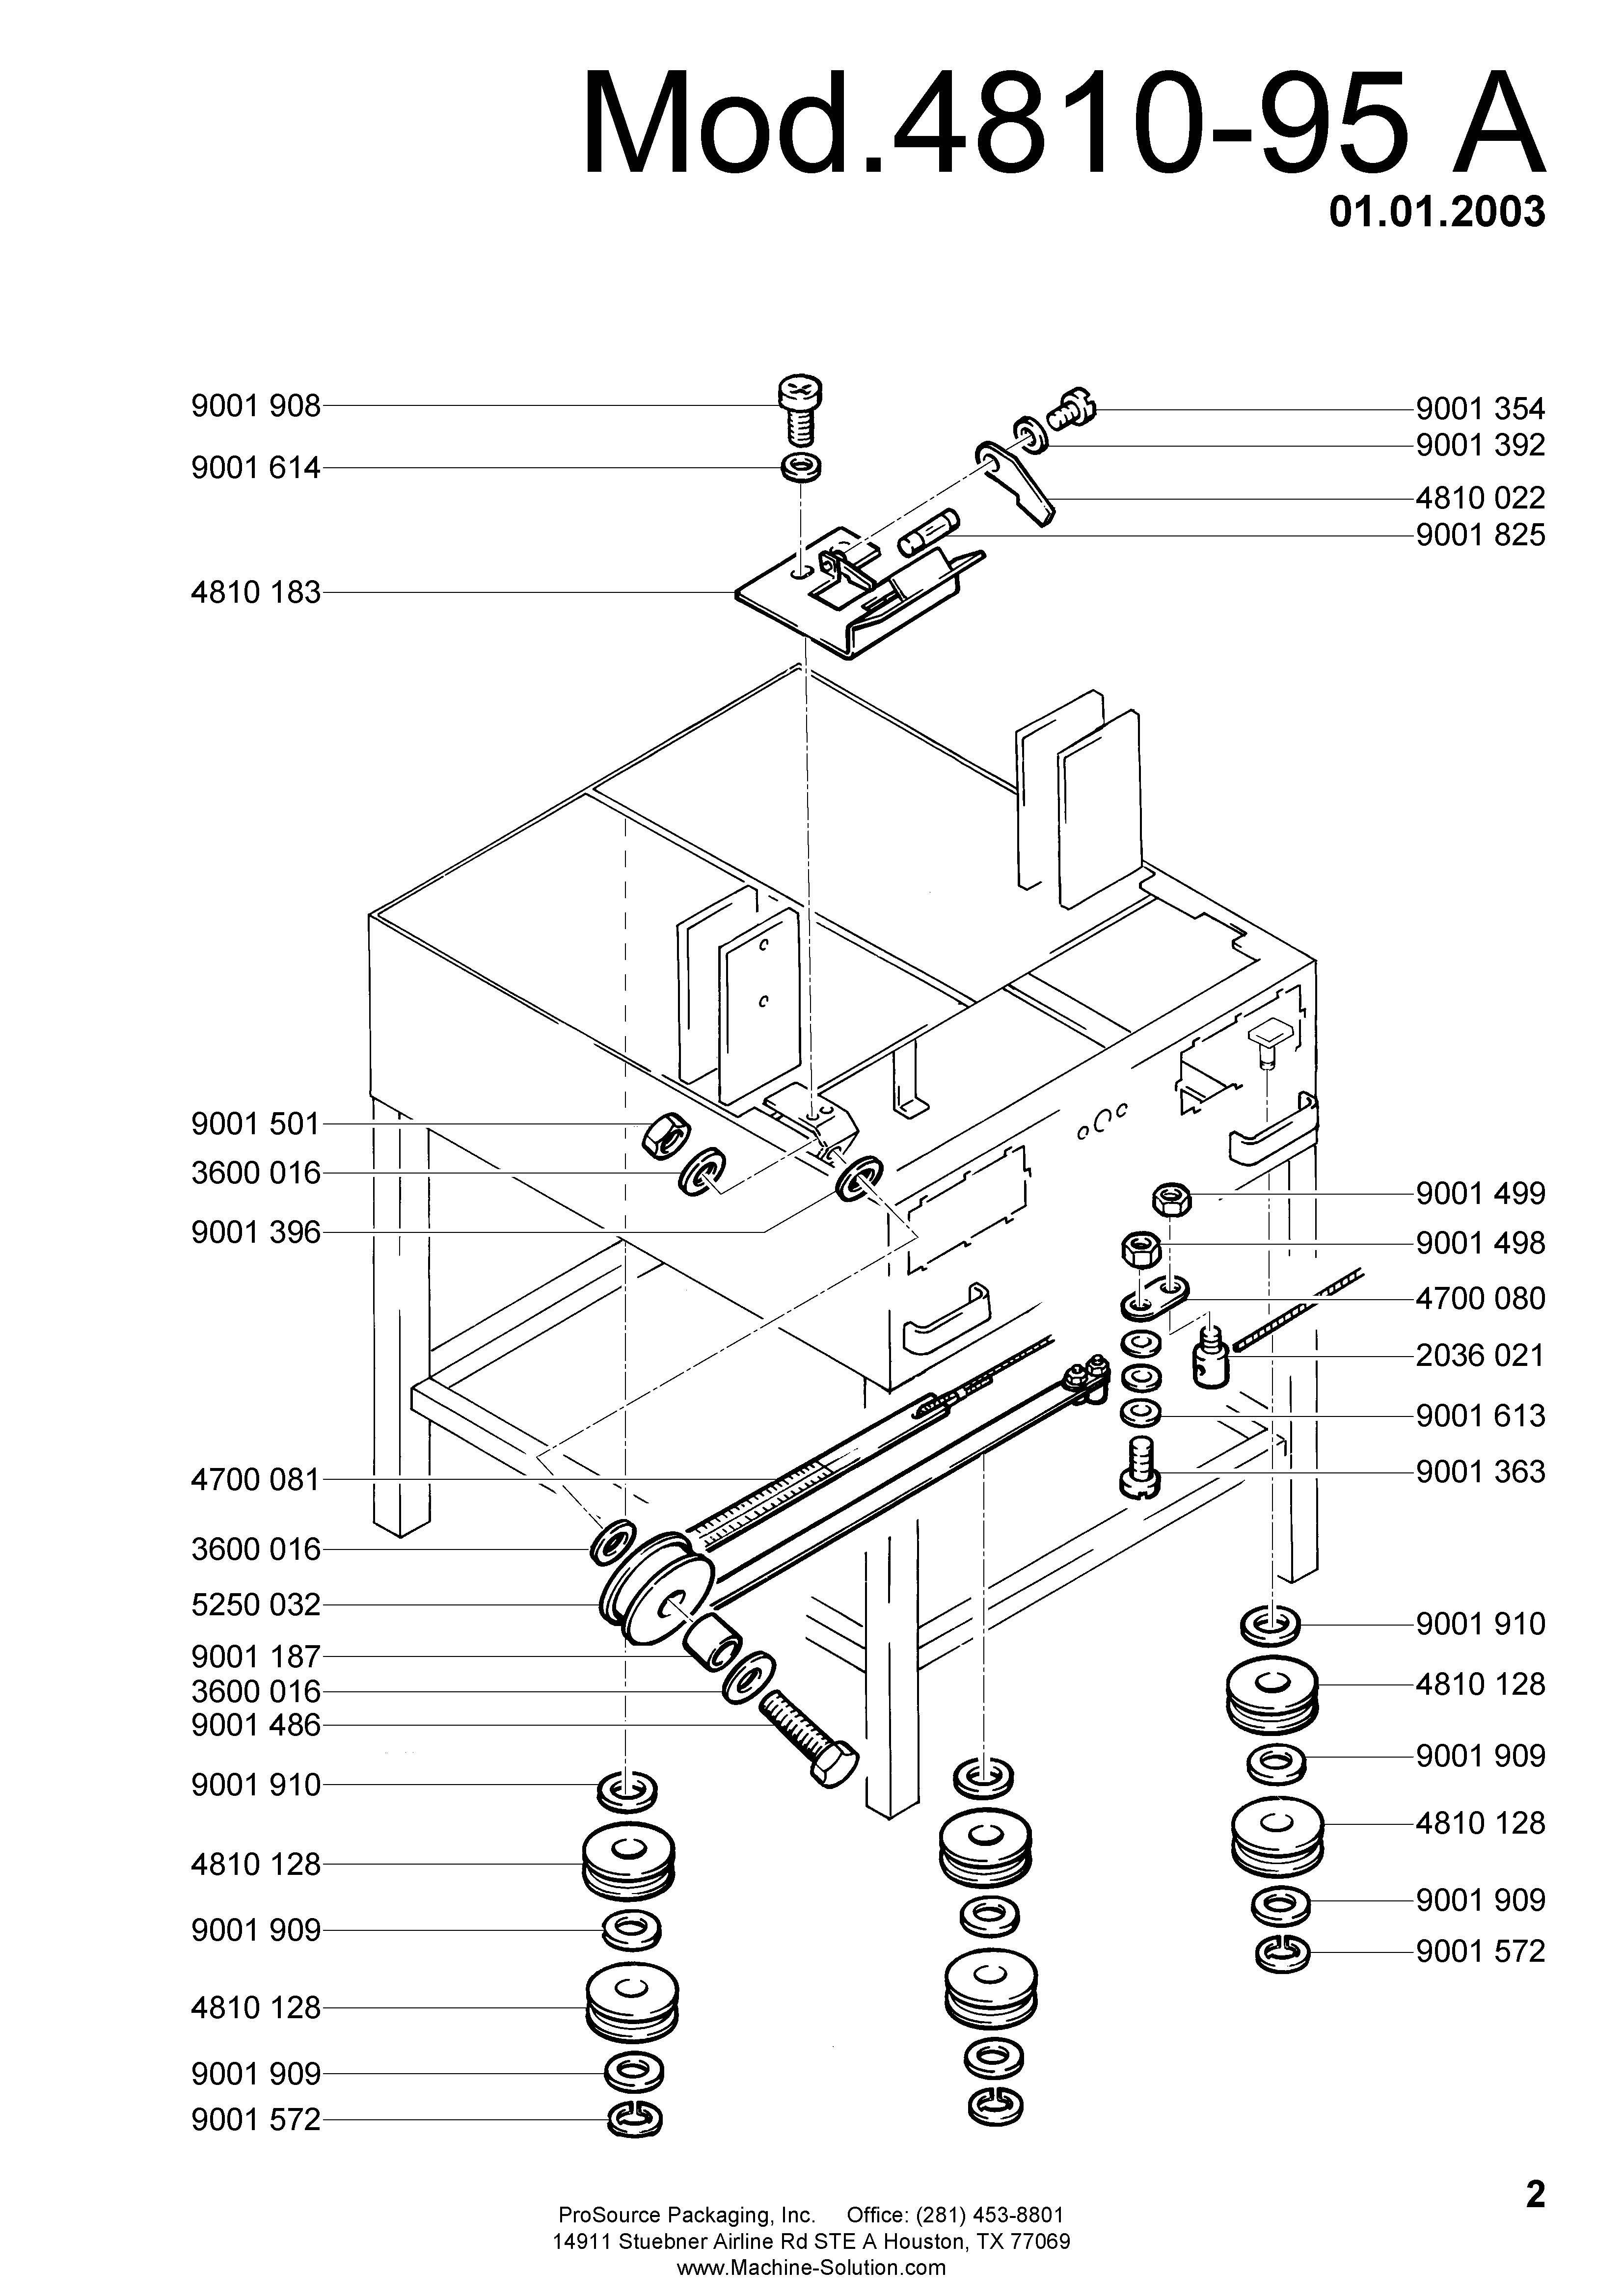 parts assistant mbm triumph 4810 95 a paper cutter rh machine solution com Human Guillotine Manufacturers Guillotine Info